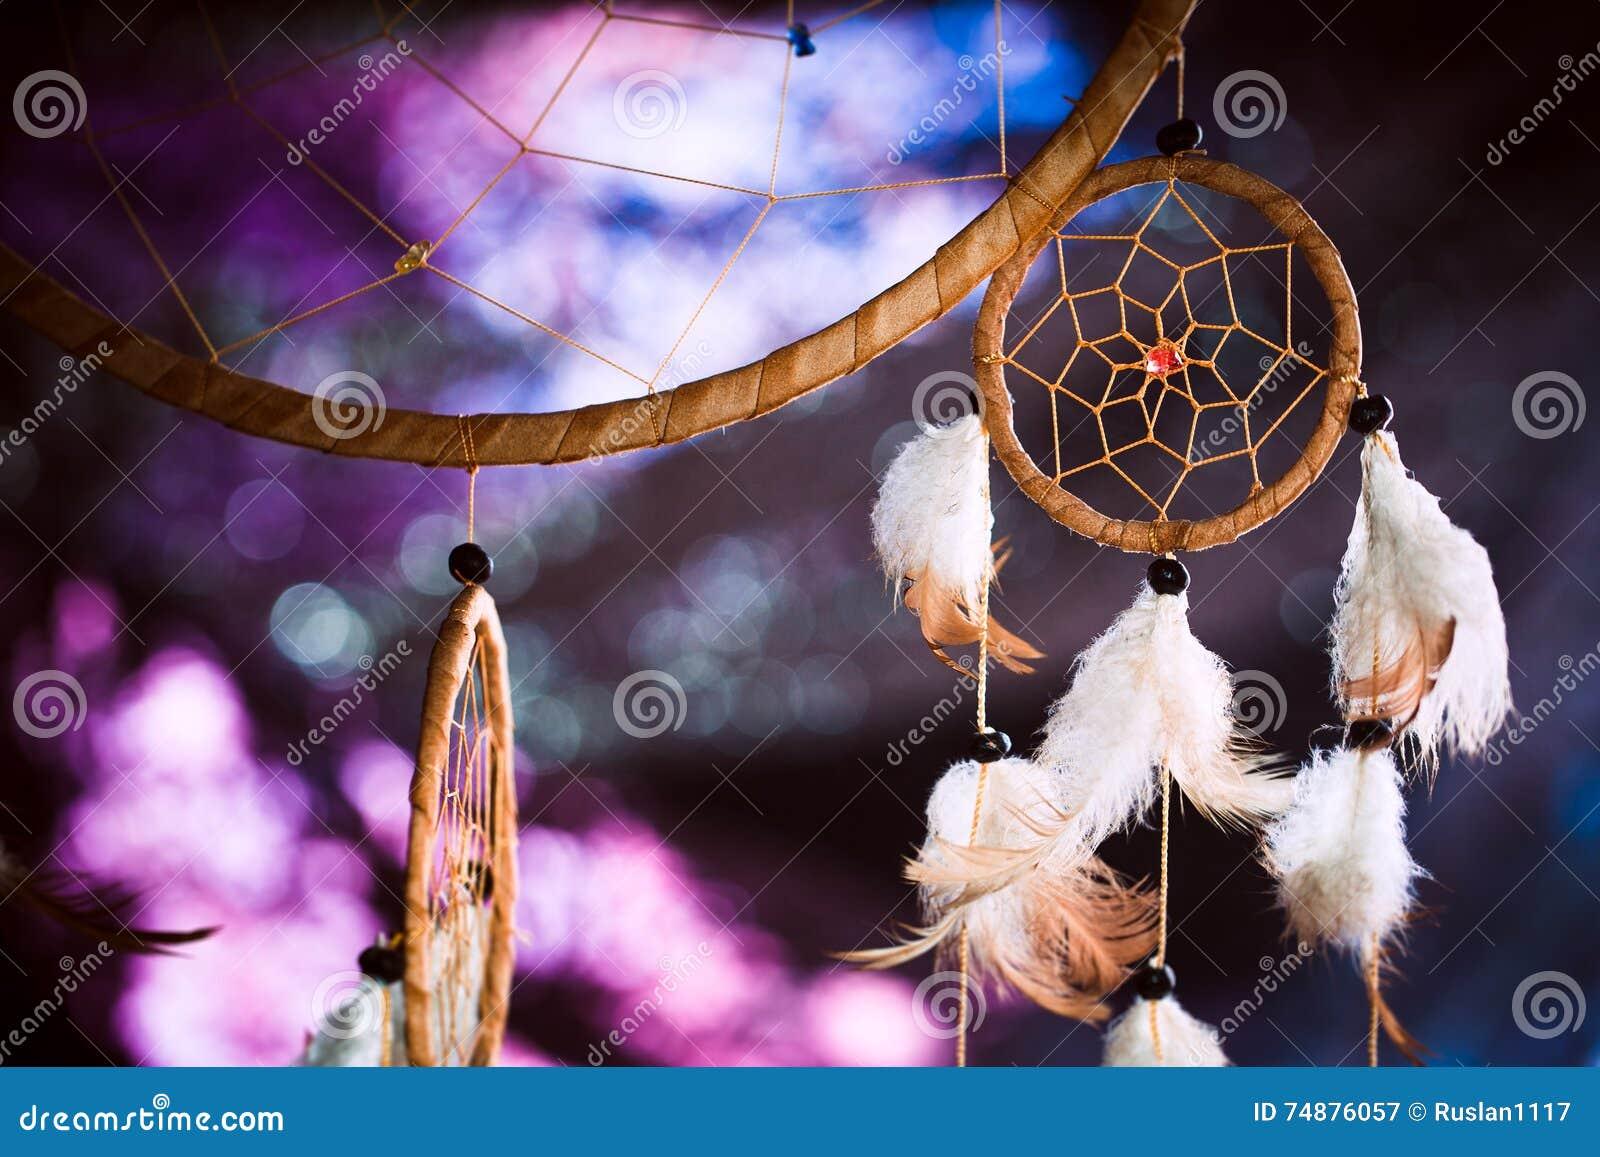 Dreamcatcher σε ένα κλίμα του πορφυρού σκοταδιού ηλιοβασιλέματος